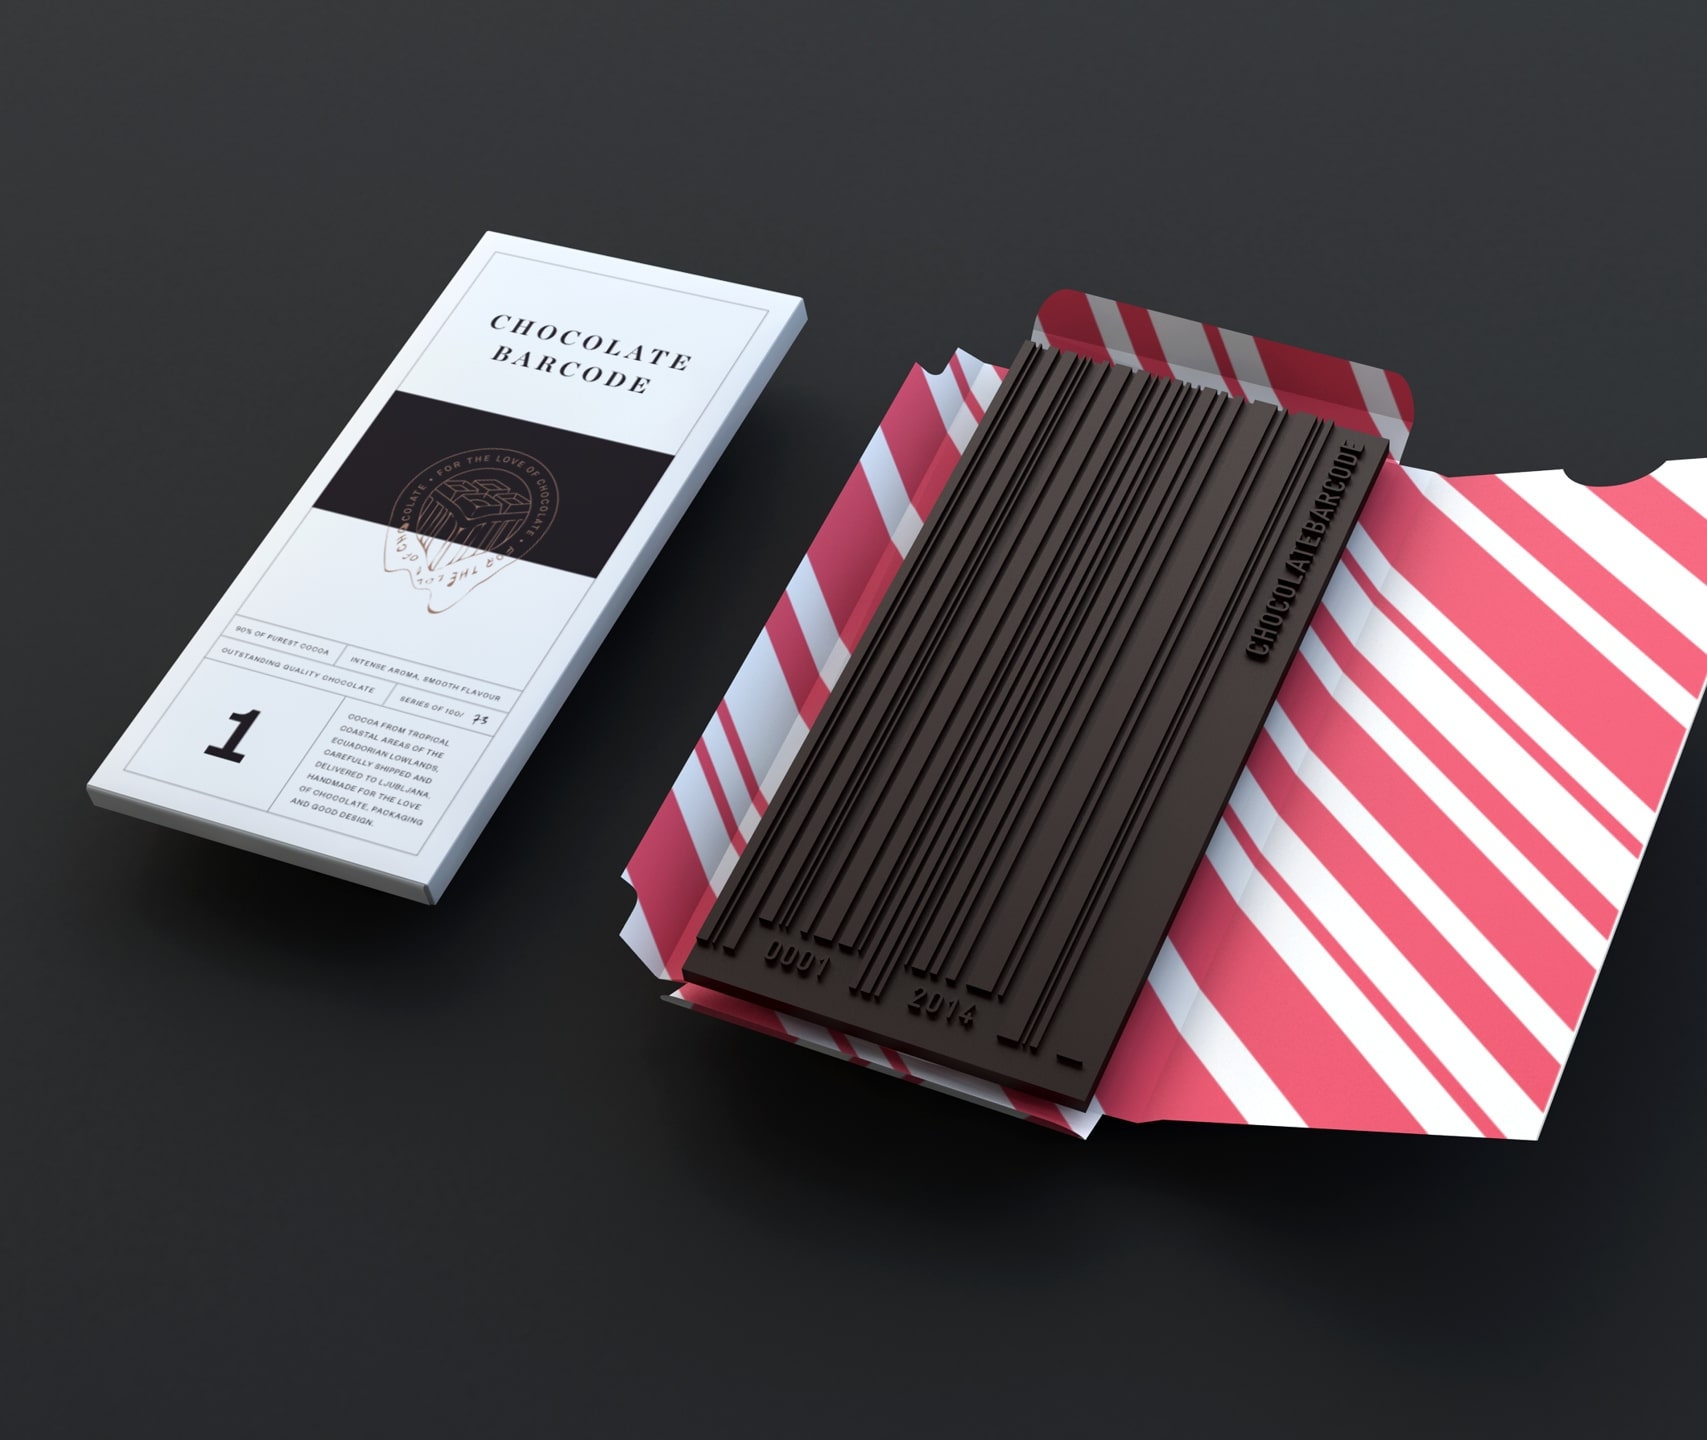 mantik-digital-branding-development-agency-chocolate-packaging-webdesign-design-13-min